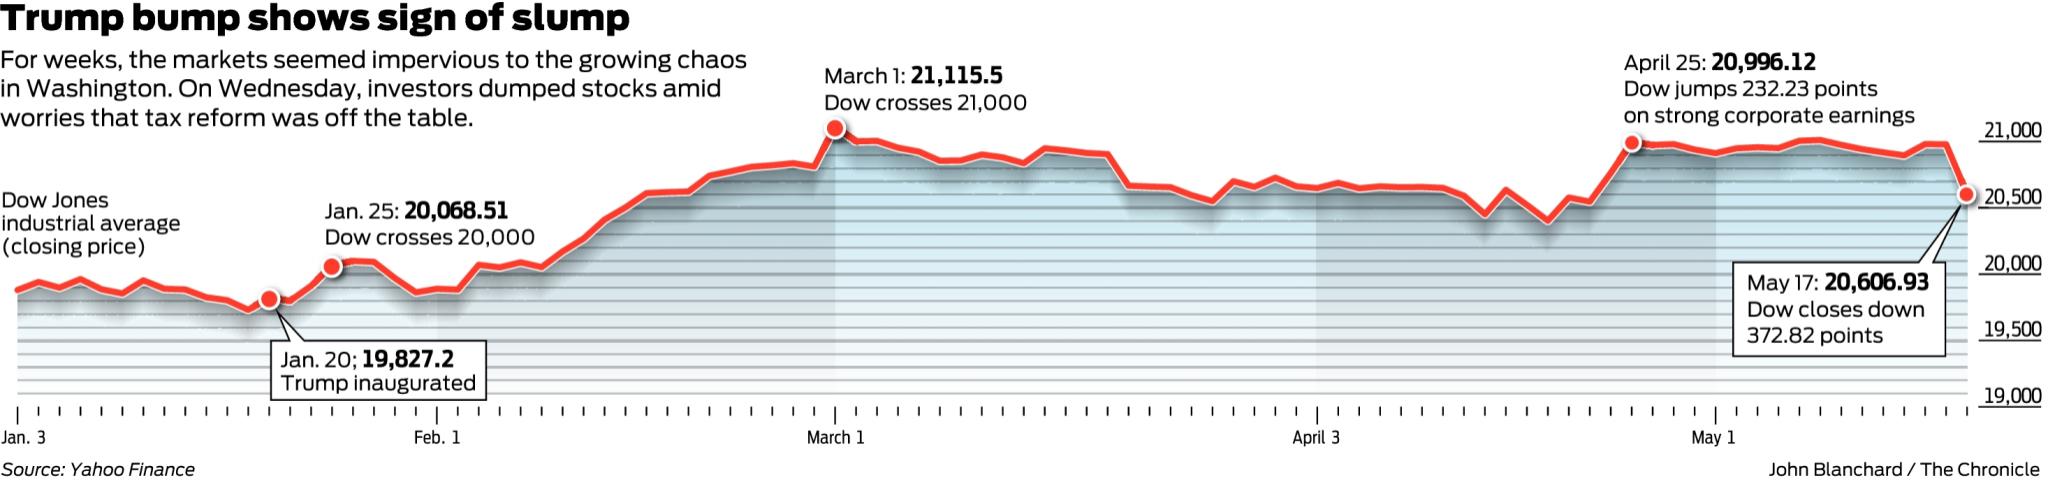 Created At 2017 05 18 1322 Harley Evo Oil Line Diagram For Engine Likewise Roque Davidson Stocks Slide As Washington Turmoil Reaches Wall Street